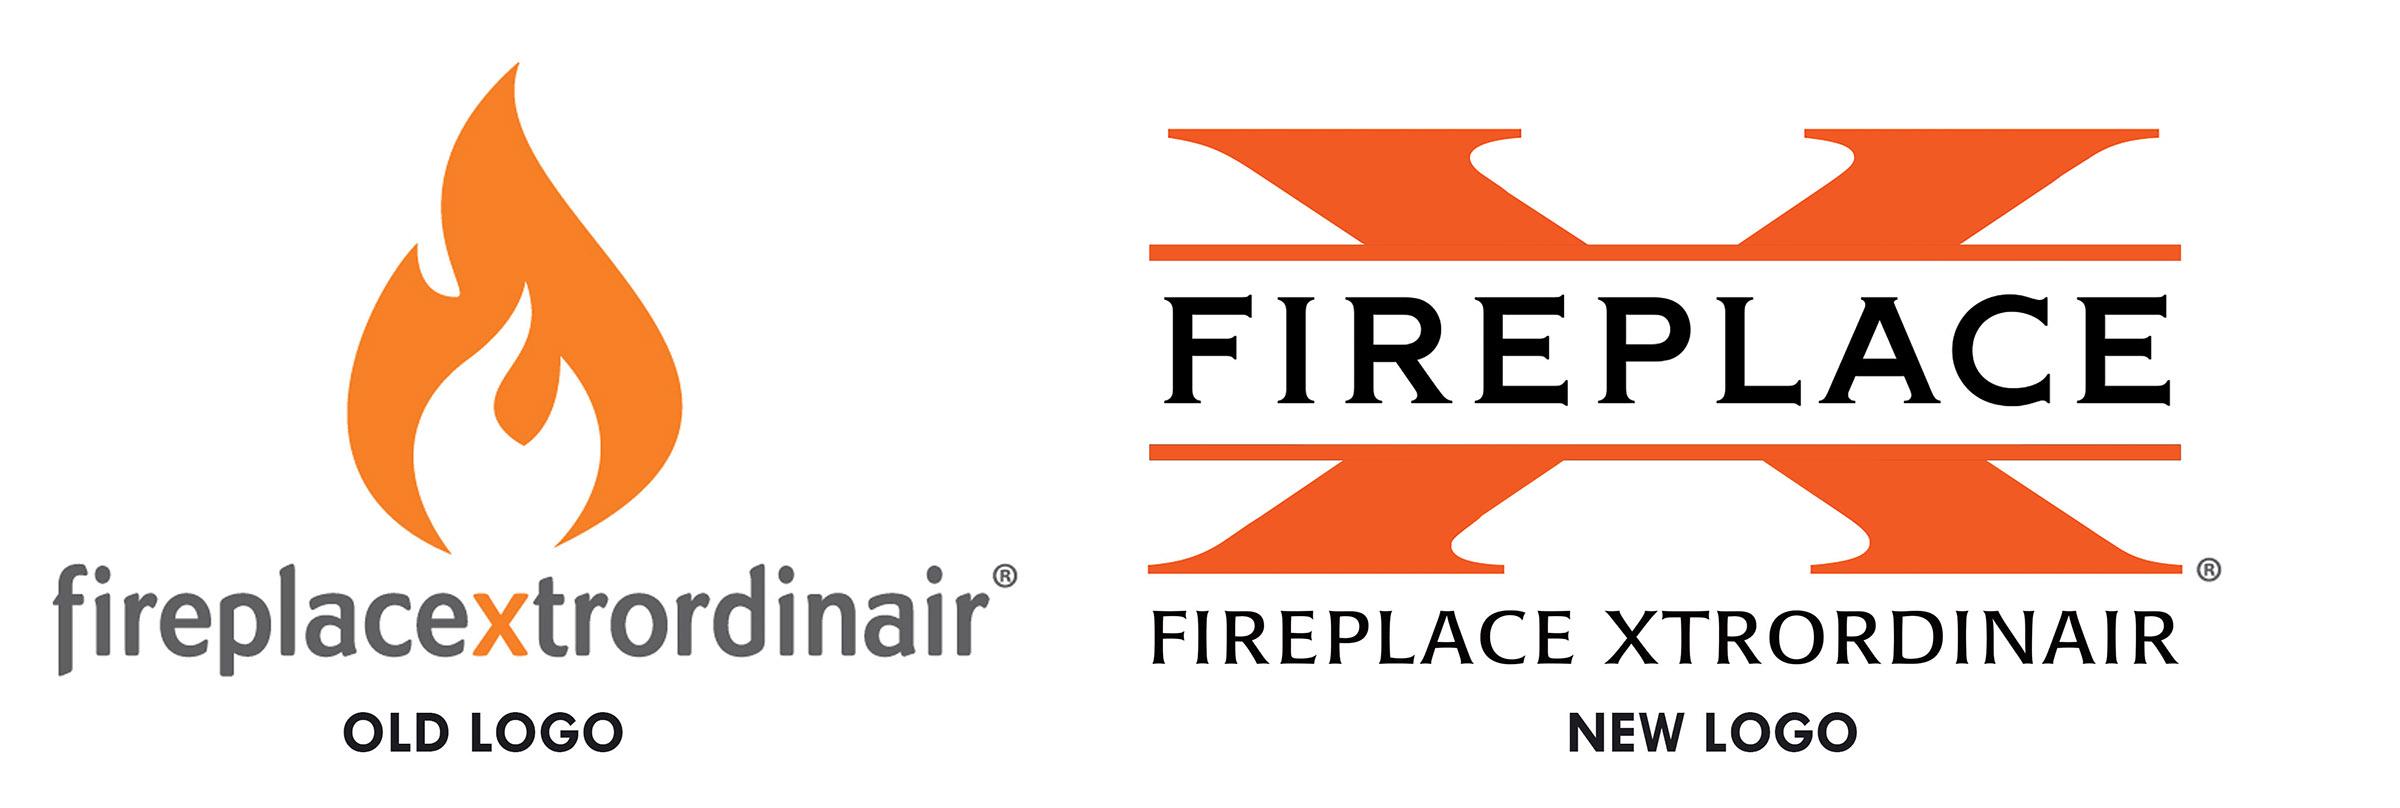 Fireplace Xtrordinair is now FireplaceX | travisdealernews